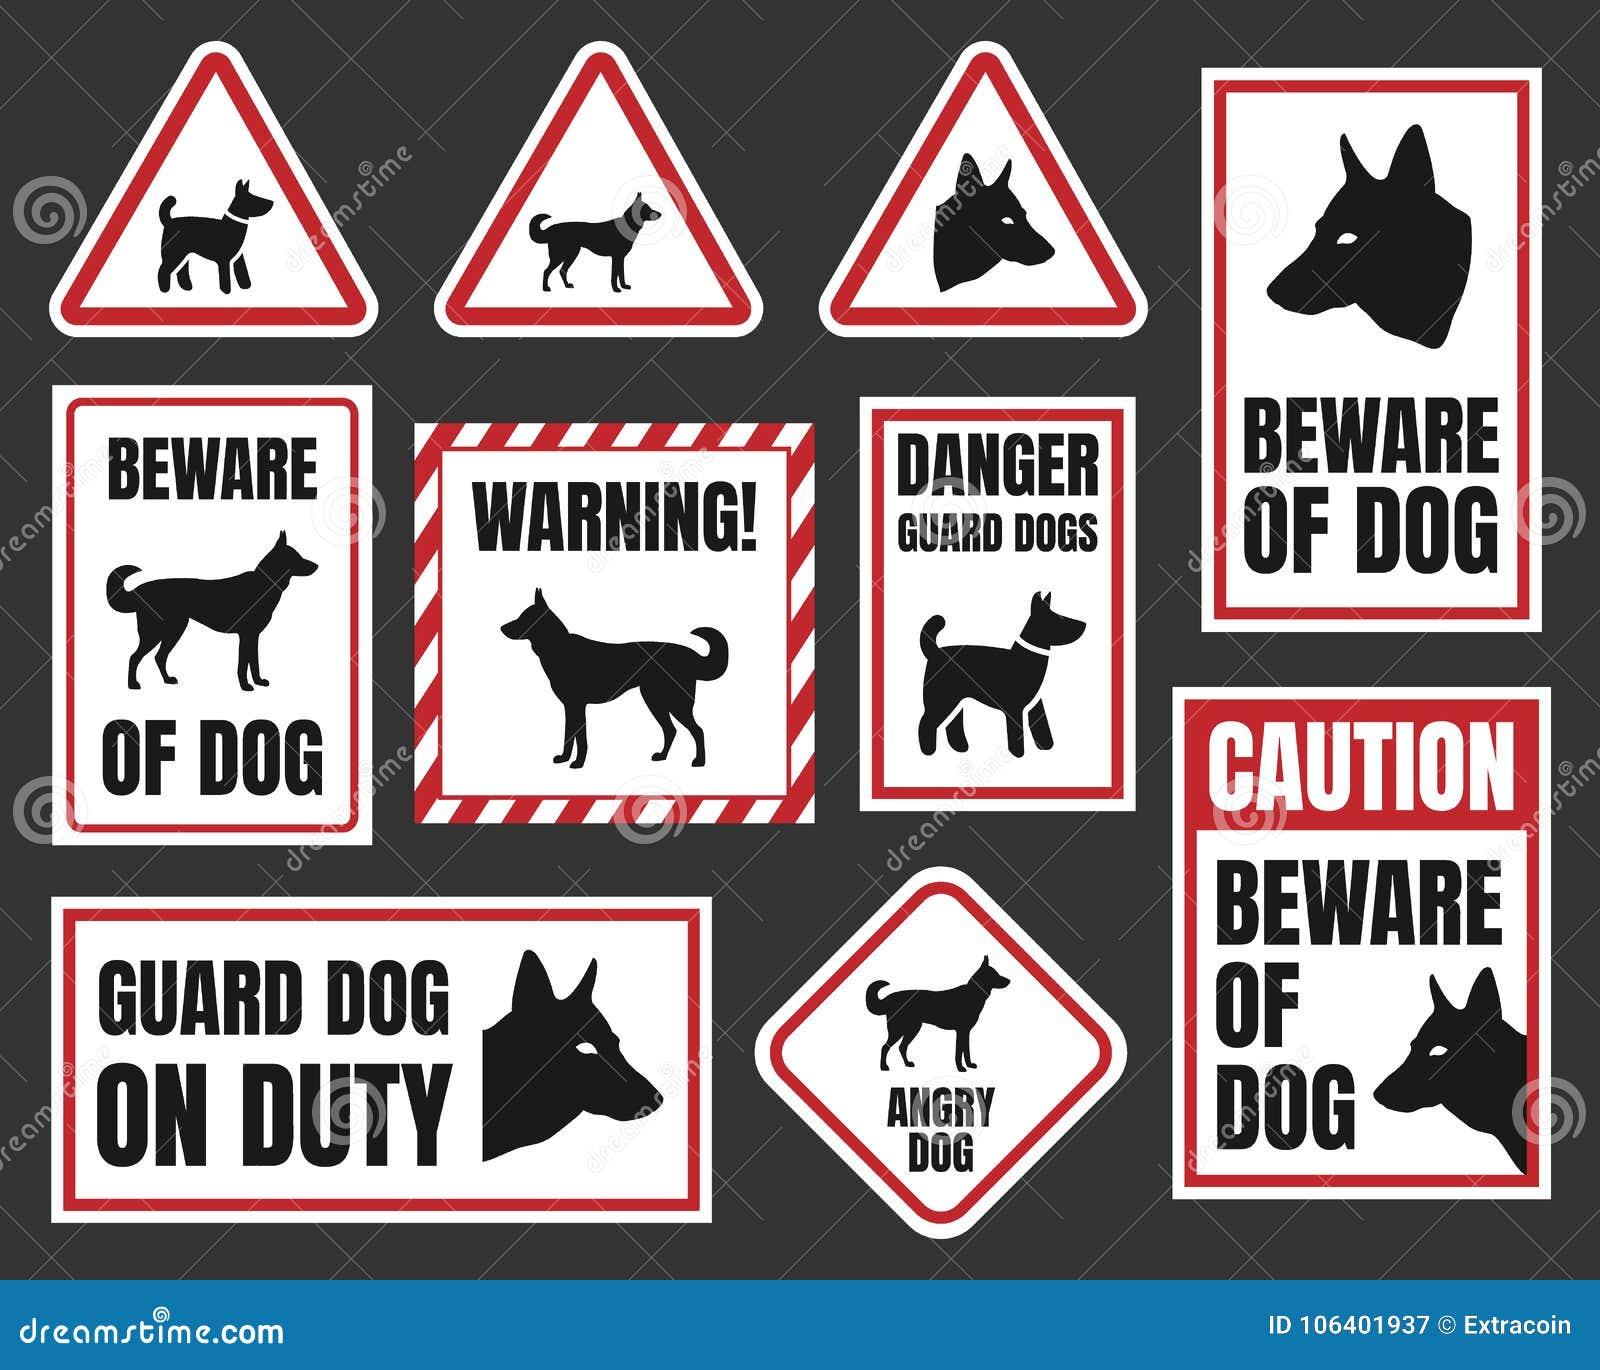 Danger Dog Signs Beware Of Dog Stock Vector Illustration Of